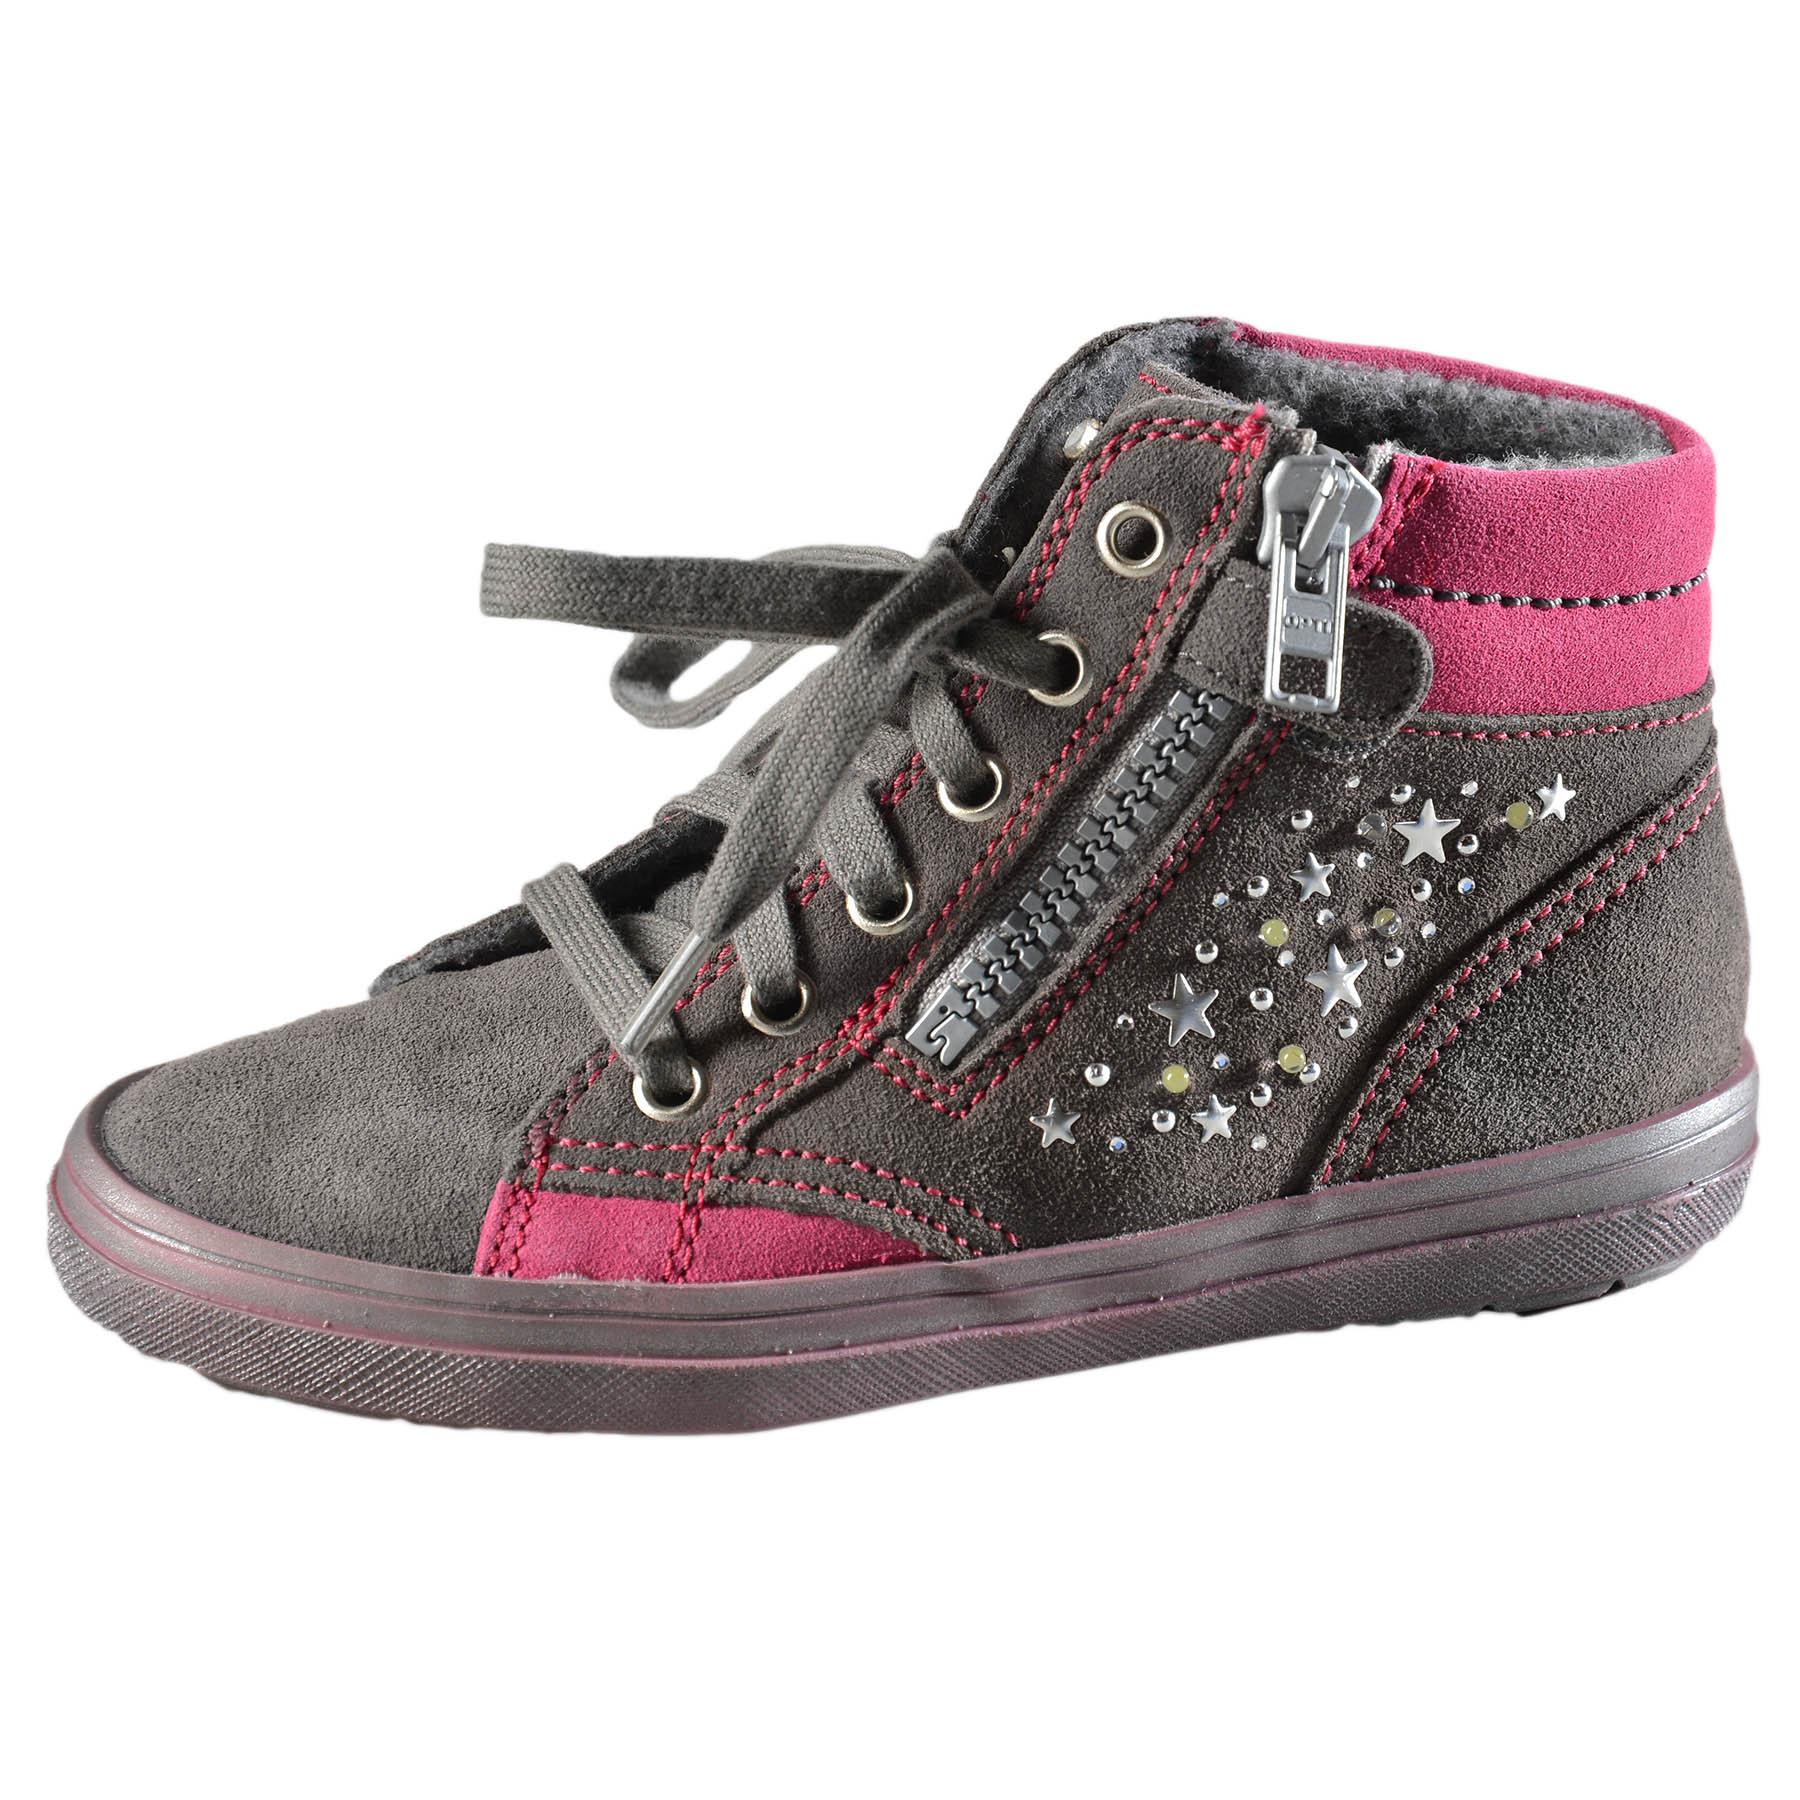 bb5da4f36ef1 Dievčenské blikajúce topánky Richter - 4449-6611